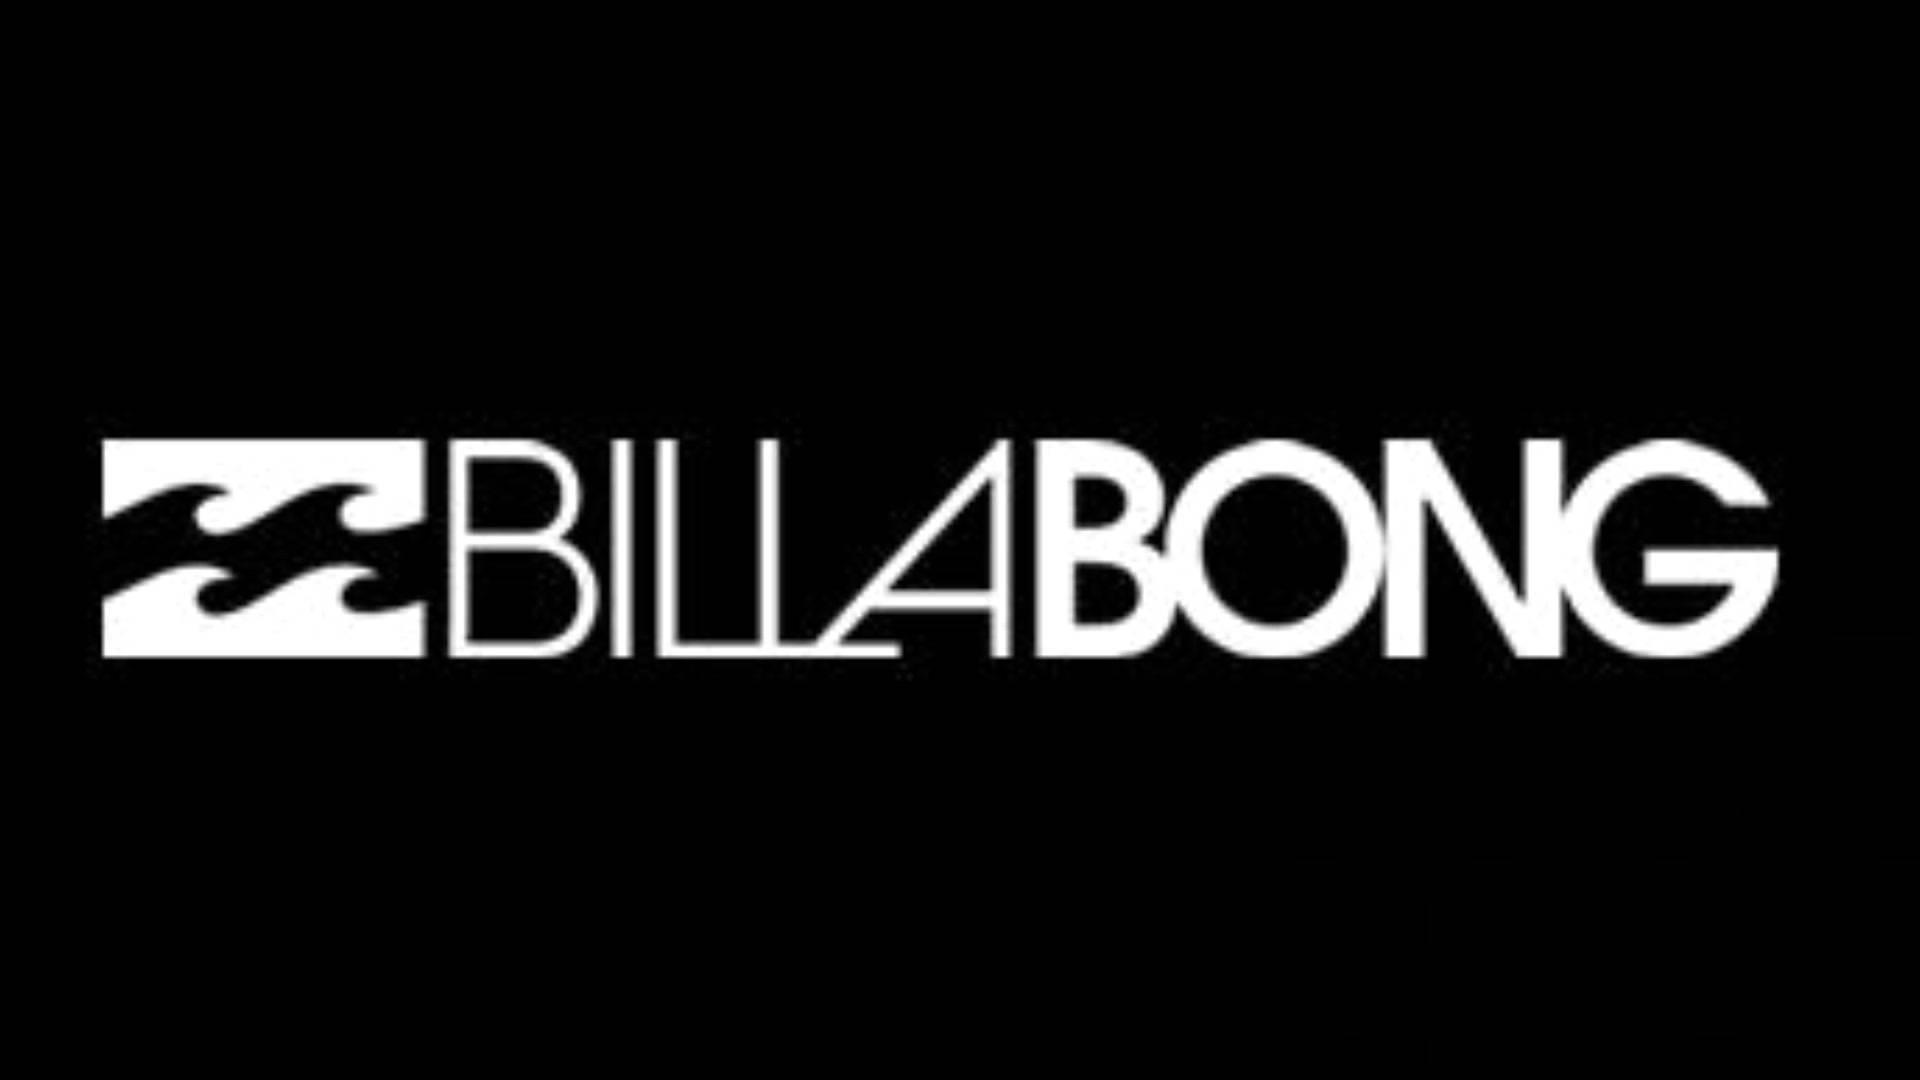 billabong wallpaper 1920x1080 69143 metal mulisha logo black and white metal mulisha logo meaning